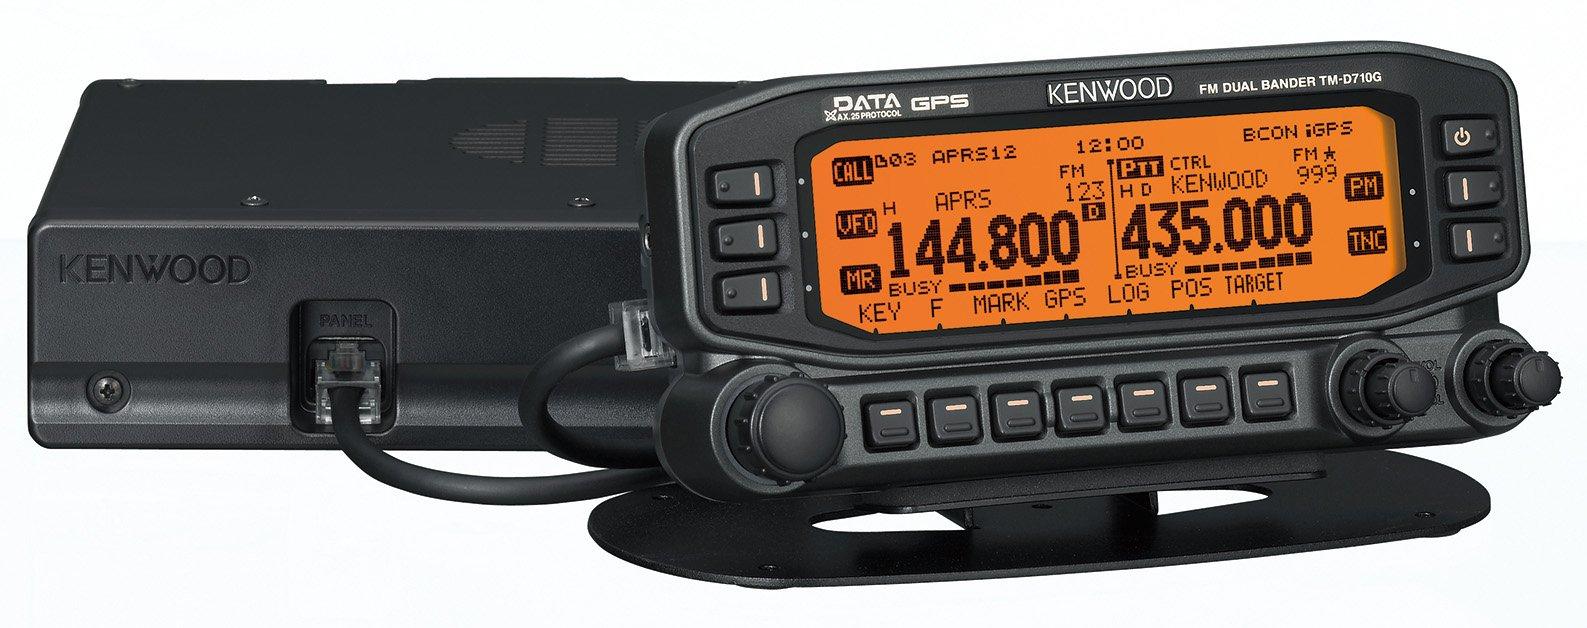 kenwood tm v71a tm v71e service repair manual pdf download